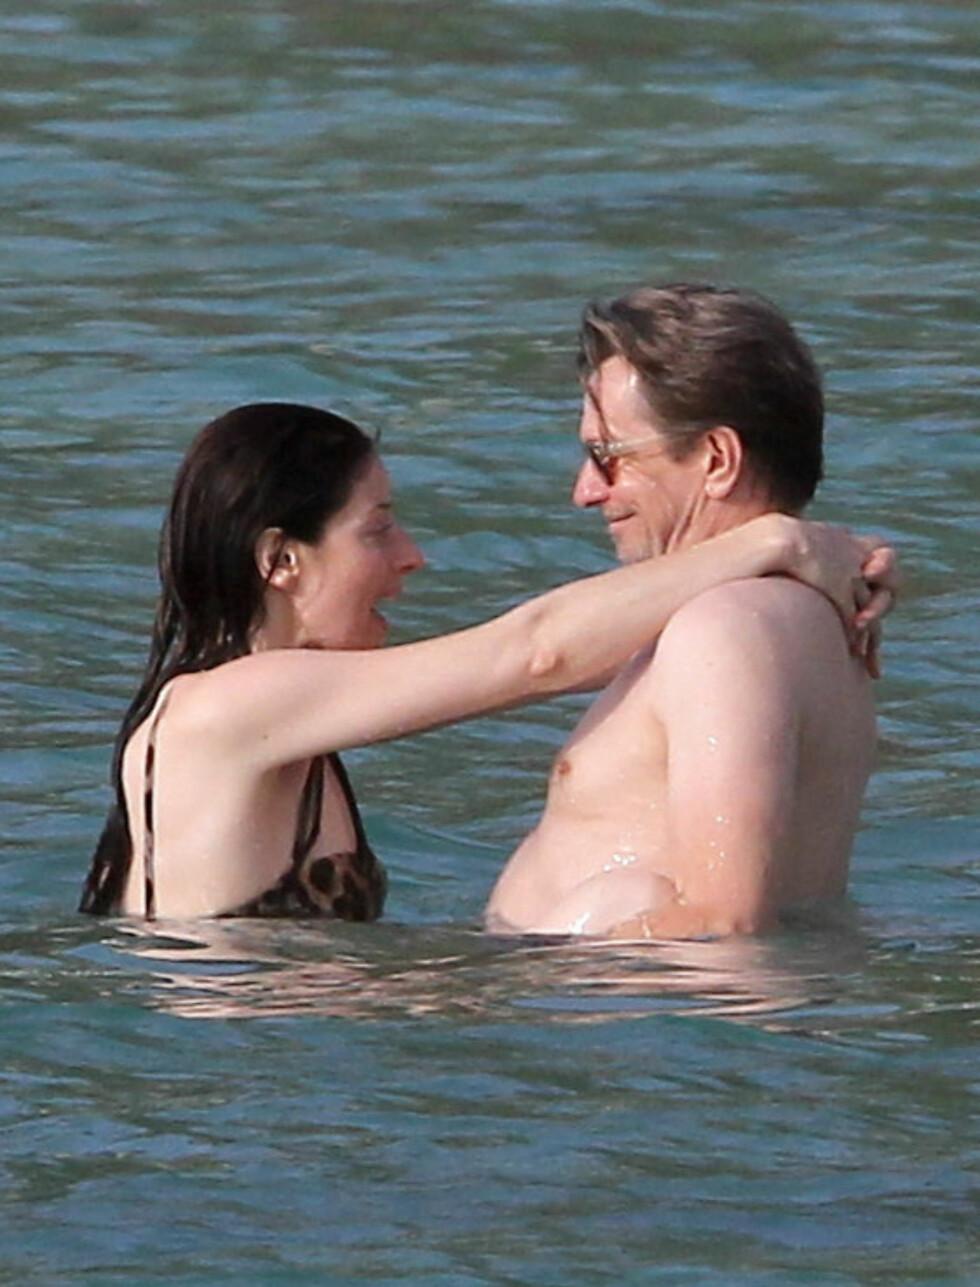 SLAPPET AV: «The Dark Knight Rises»-stjernen Gary Oldman hadde en rolig helg med kona Alexandra på øya St. Barths i Karibia, langt unna tragedien i Colorado.  Foto: STELLA PICTURES